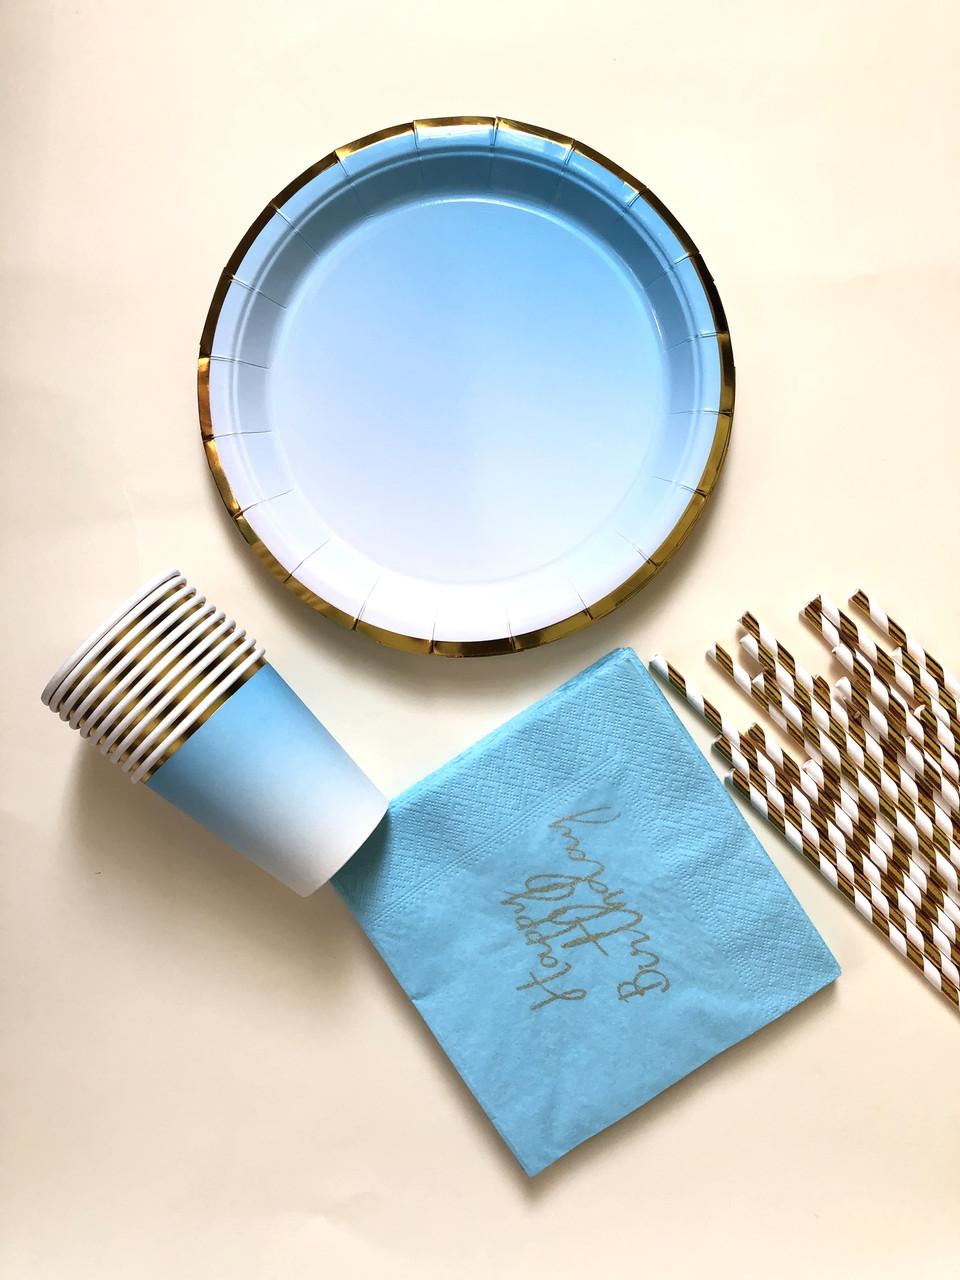 Набор посуды для праздника Тренд голубой омбре